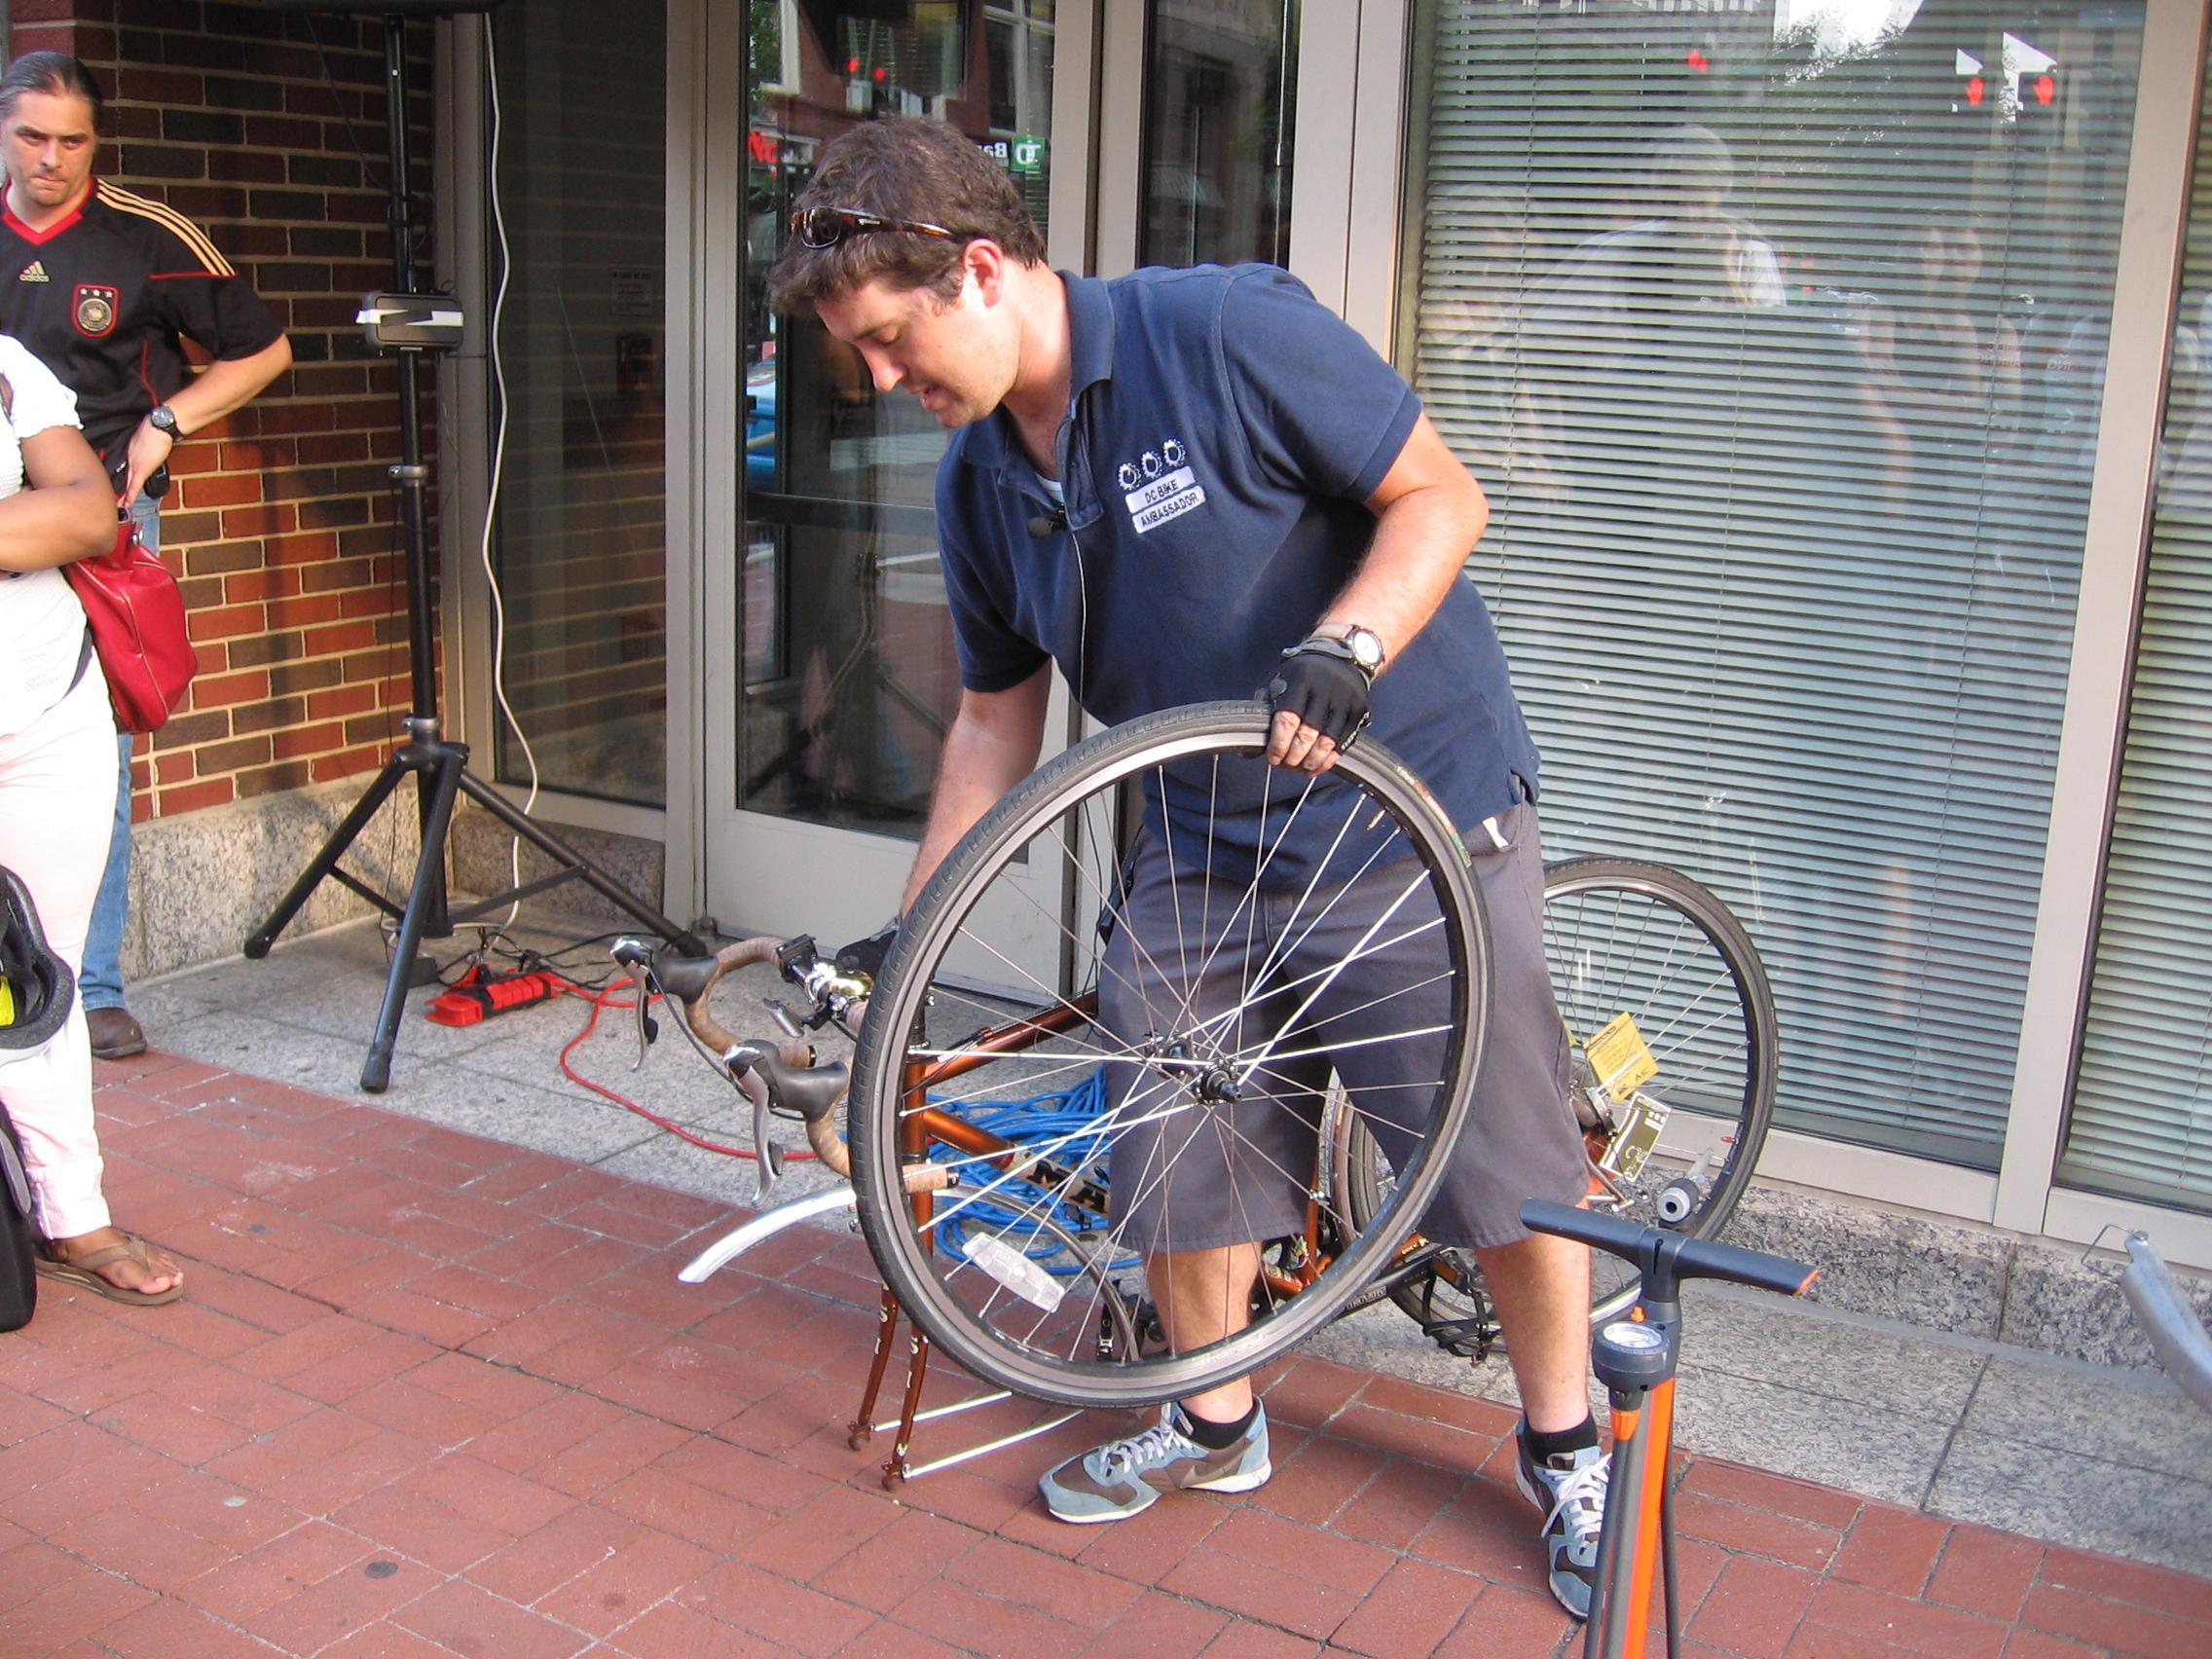 D.C. Bike Ambassador Daniel Hoagland demonstrates how to change a bike tire. Photo via Sylvia Blume.